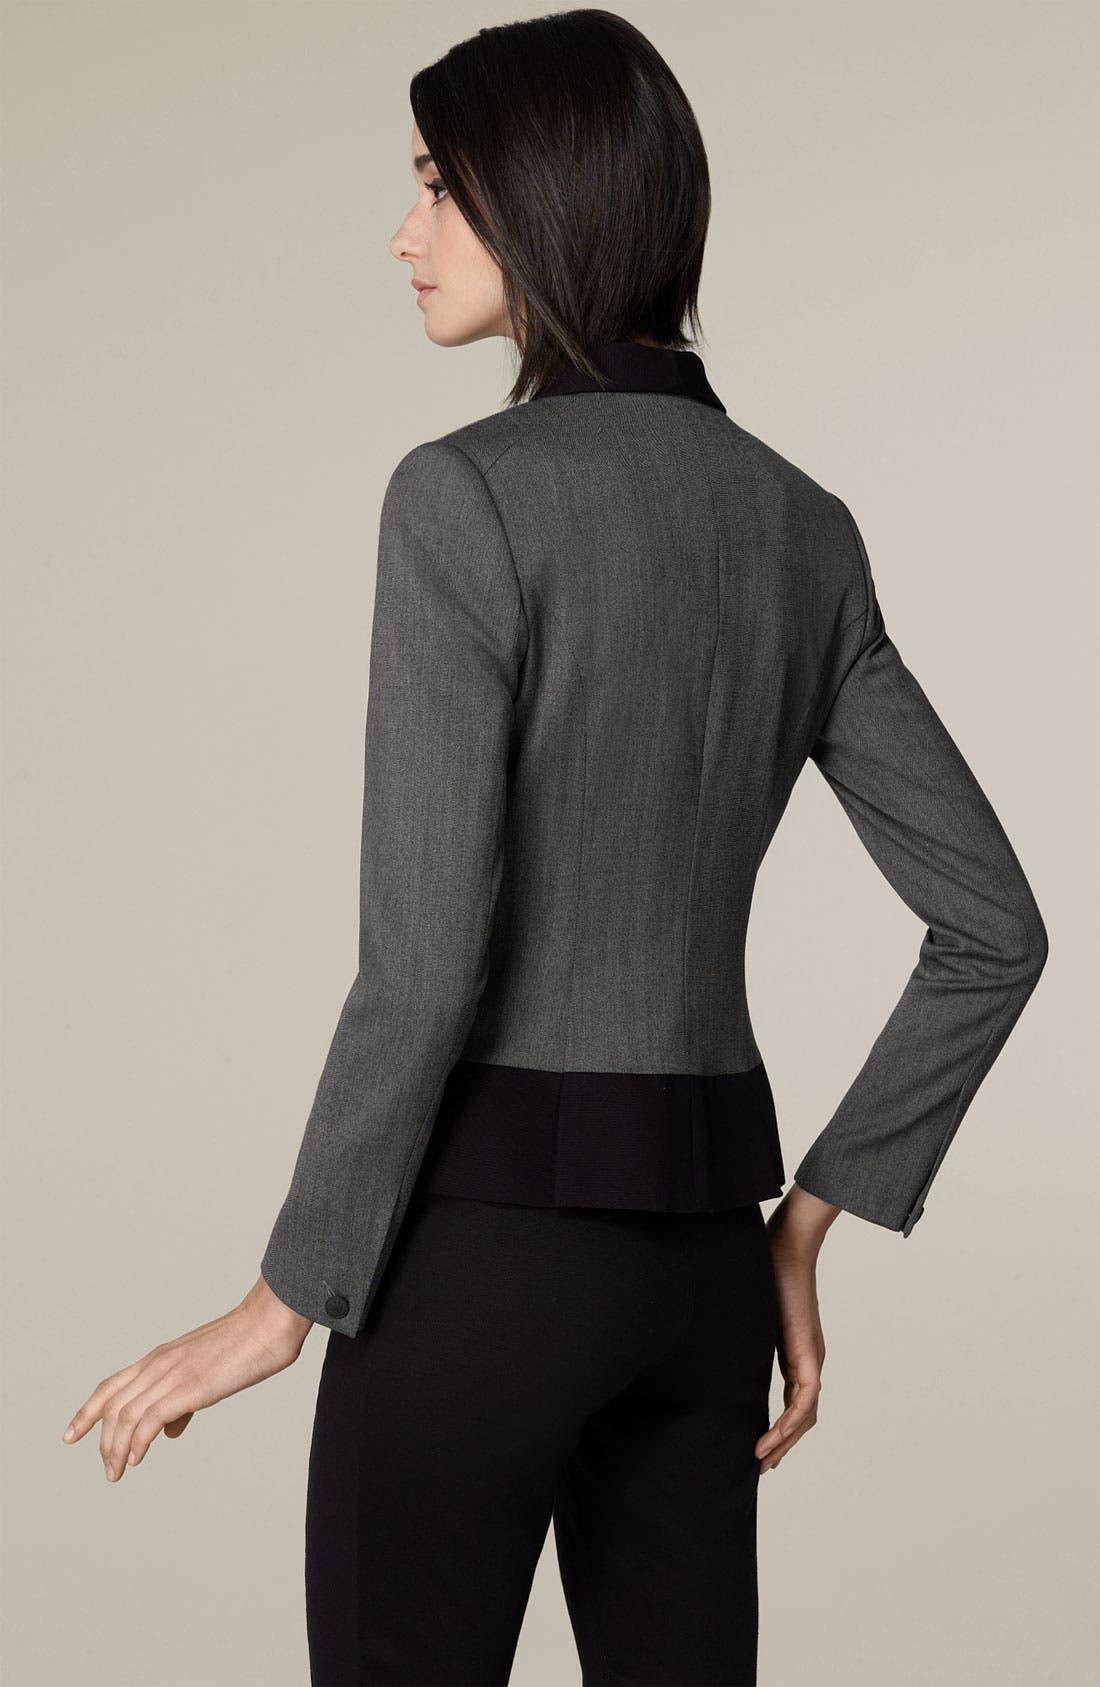 'Jem' One Button Stretch Wool Jacket,                             Alternate thumbnail 2, color,                             Smoke